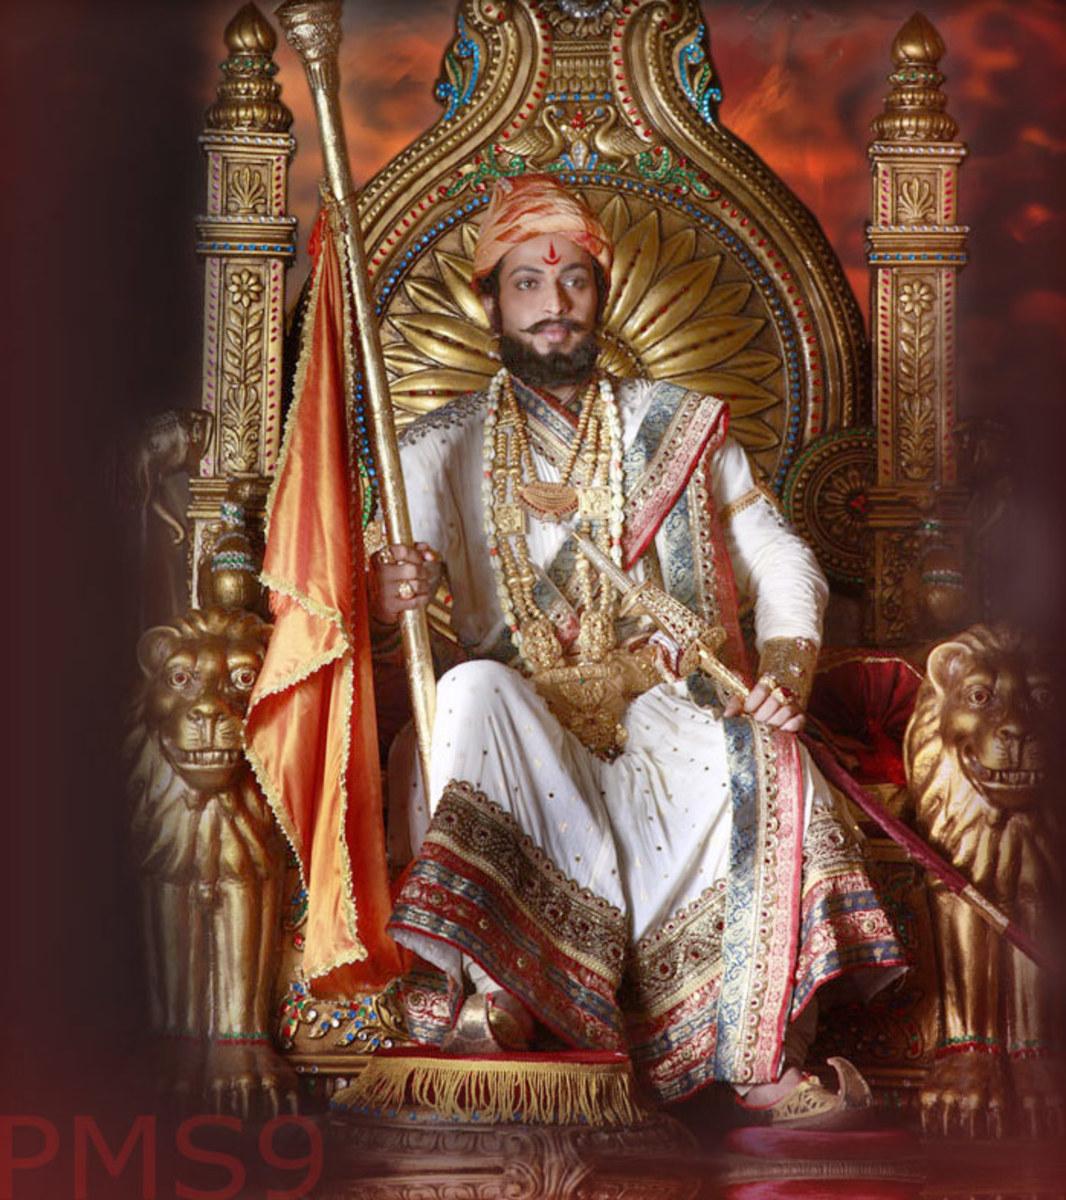 Shivaji Maharaj Wallpaper Hd 3d Raja Shivchatrapati Shivaji